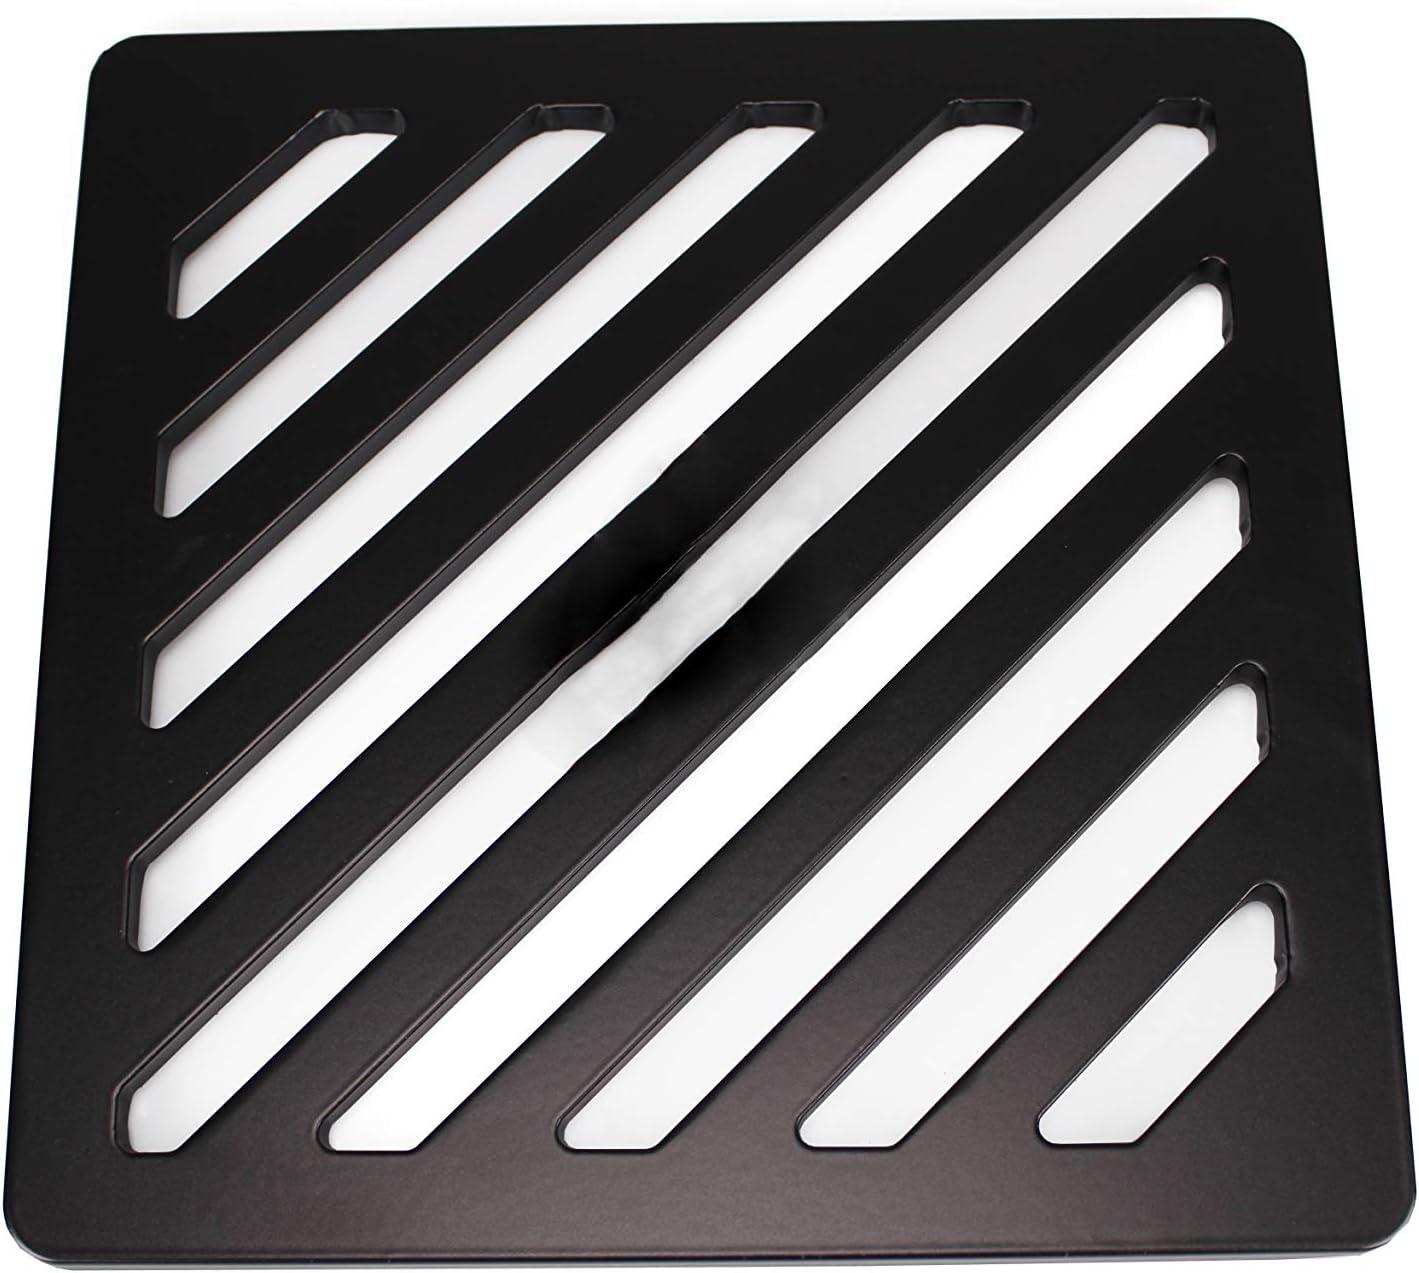 st/ärker 20,3/cm Zoll quadratische Edelstahl massiv Metall Stahl Schlucht Grid Heavy Duty Abfluss Cover ROST wie Gusseisen